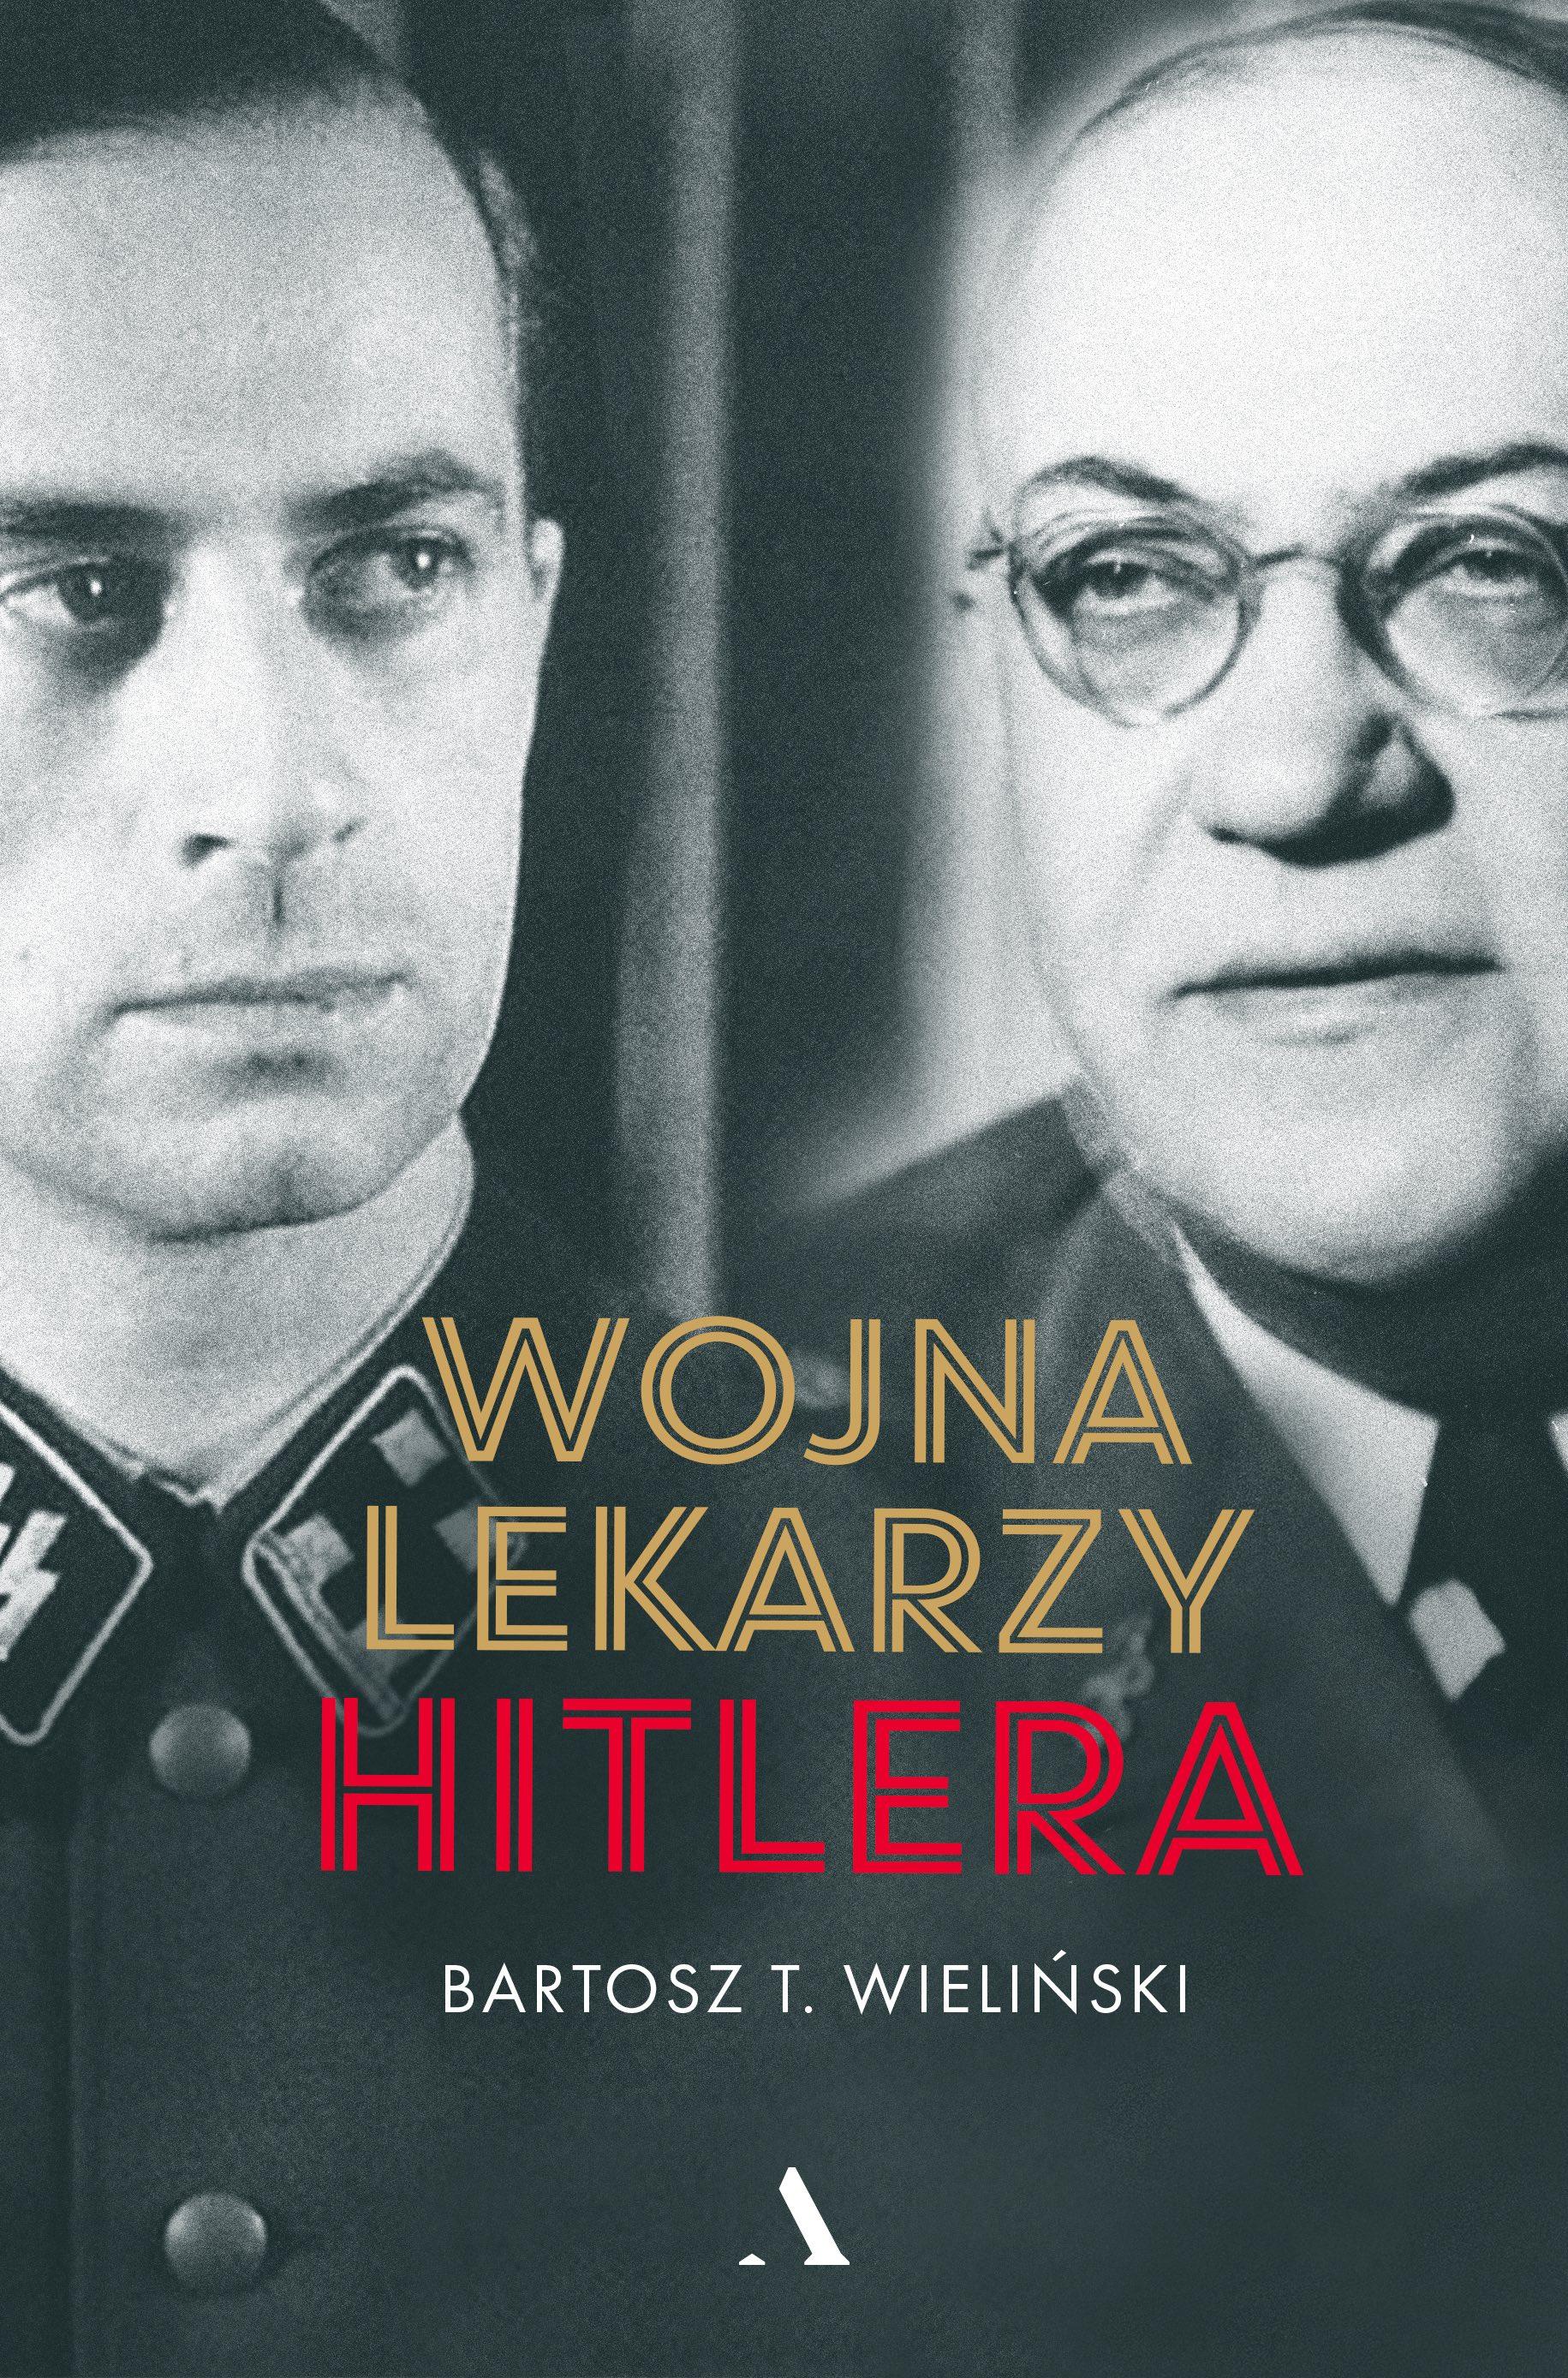 Wojna lekarzy Hitlera